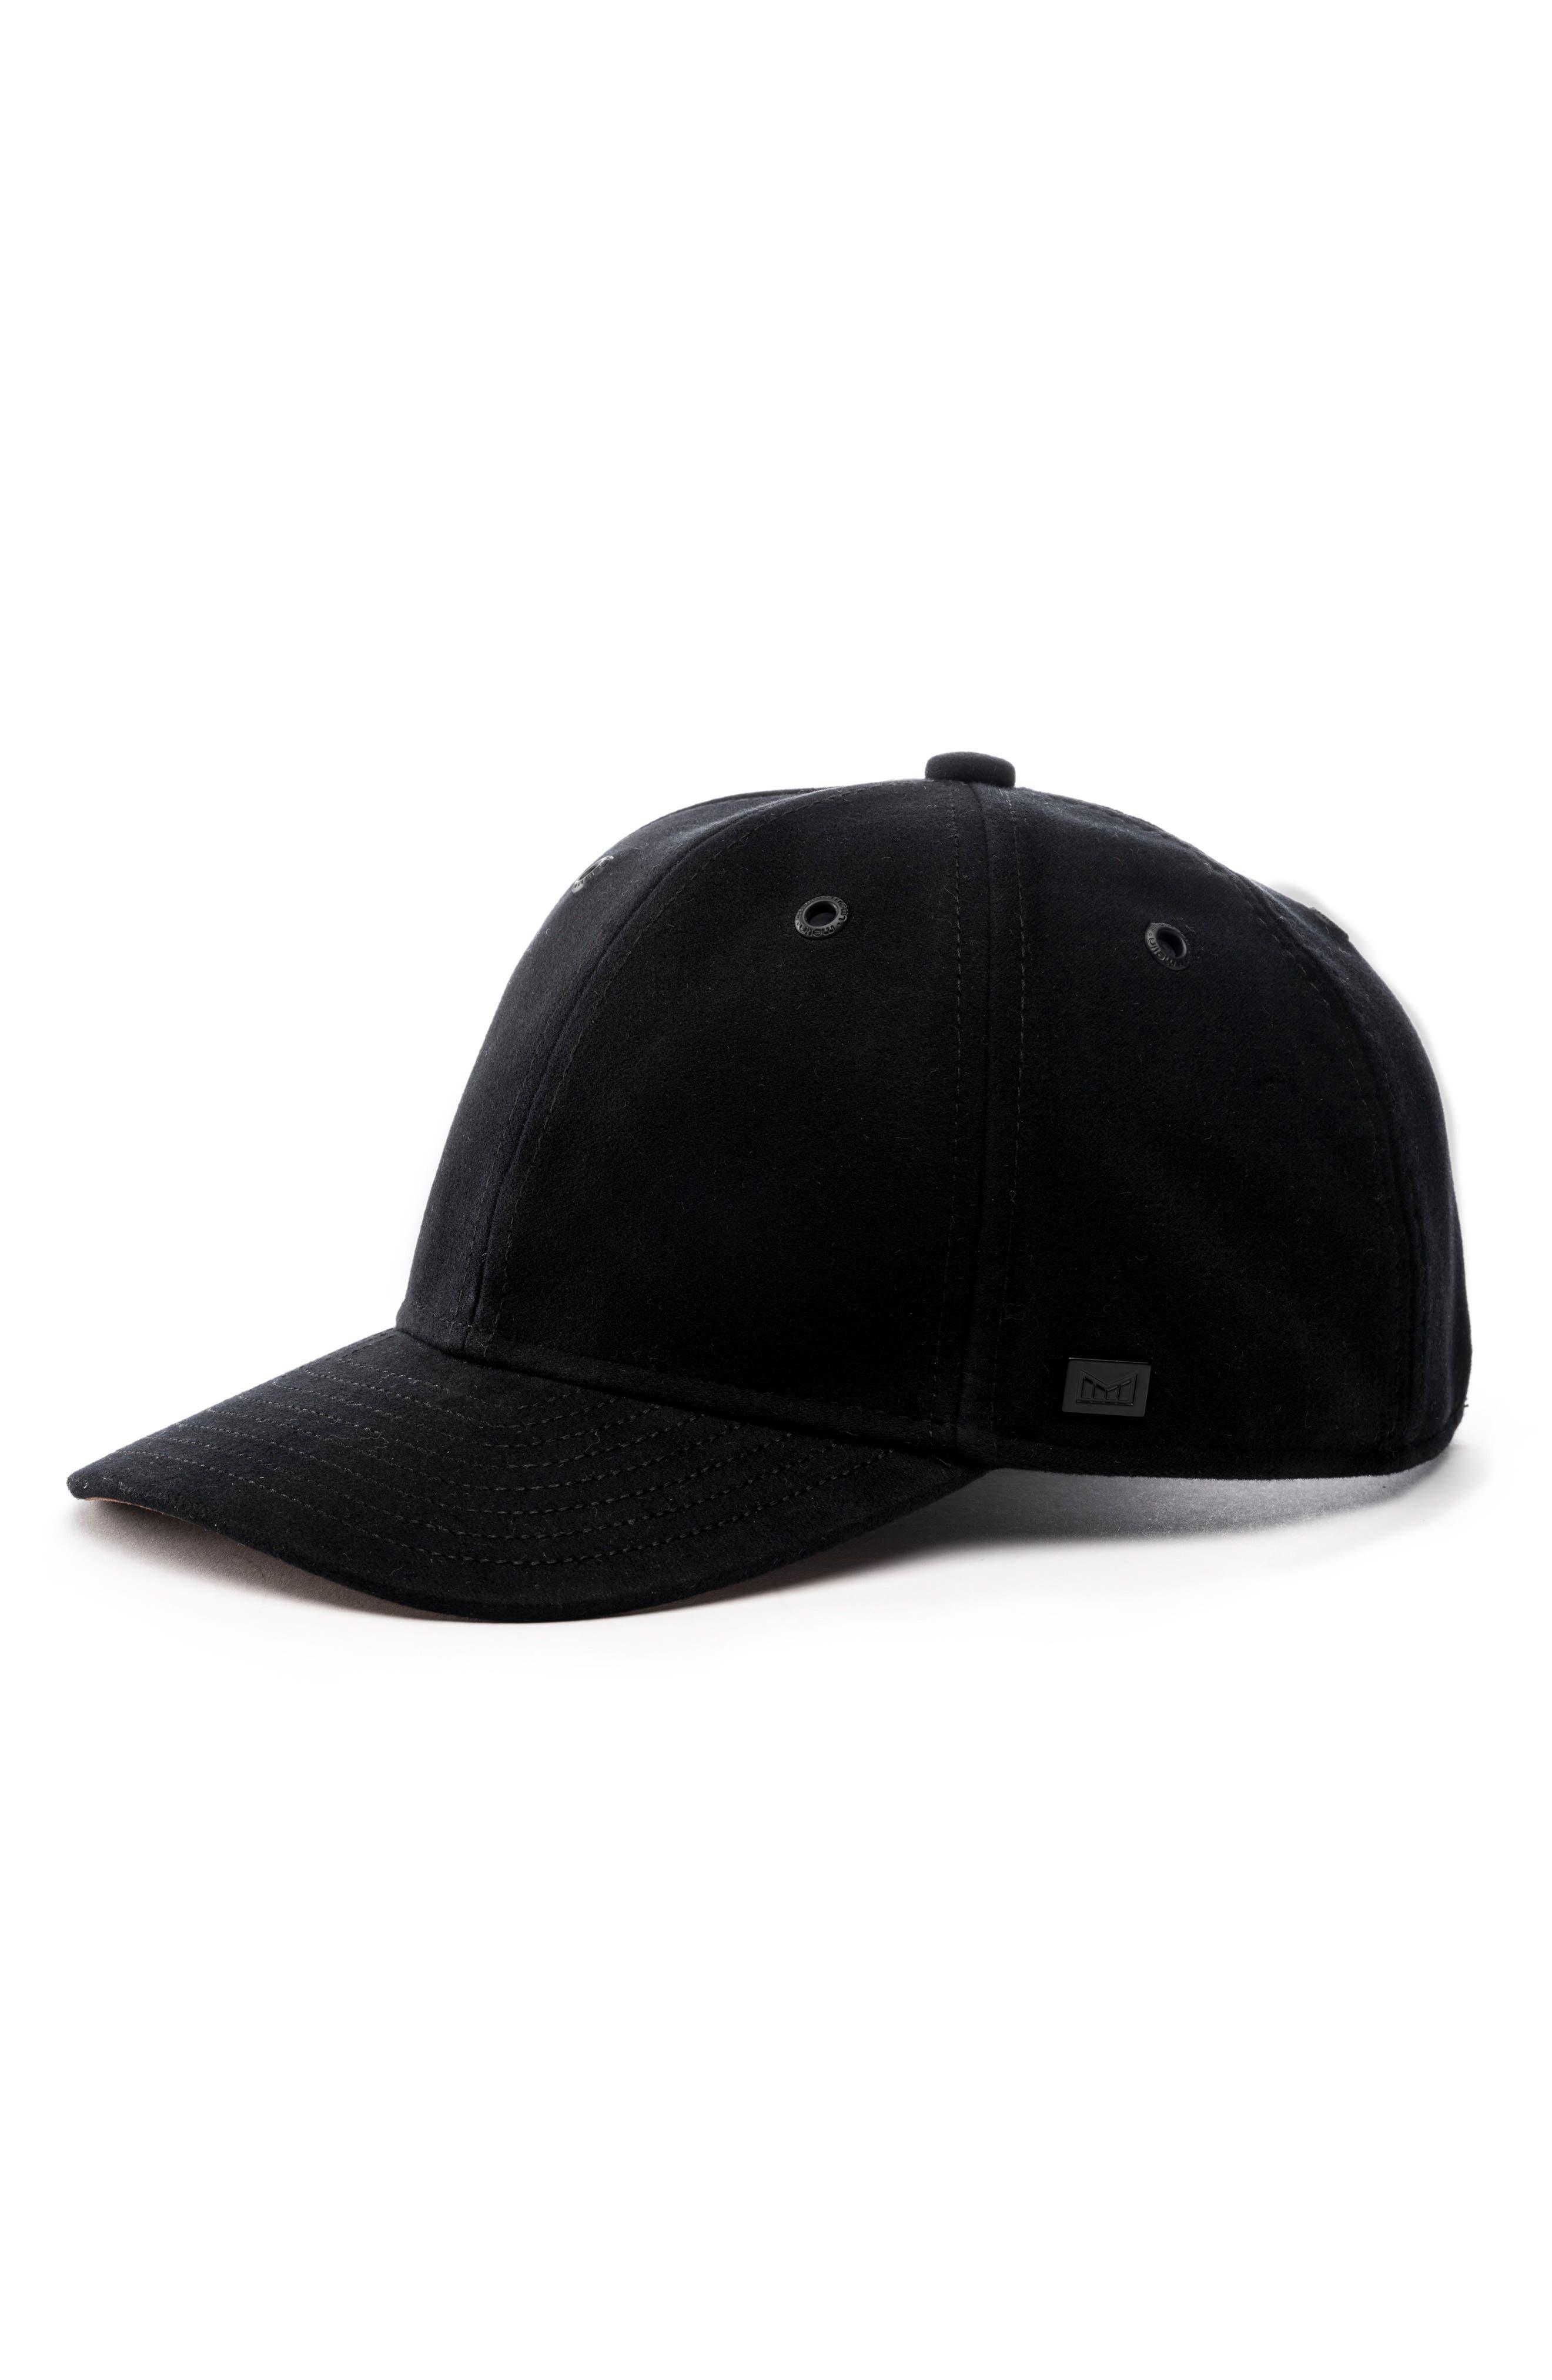 Ace Ball Cap,                         Main,                         color, BLACK